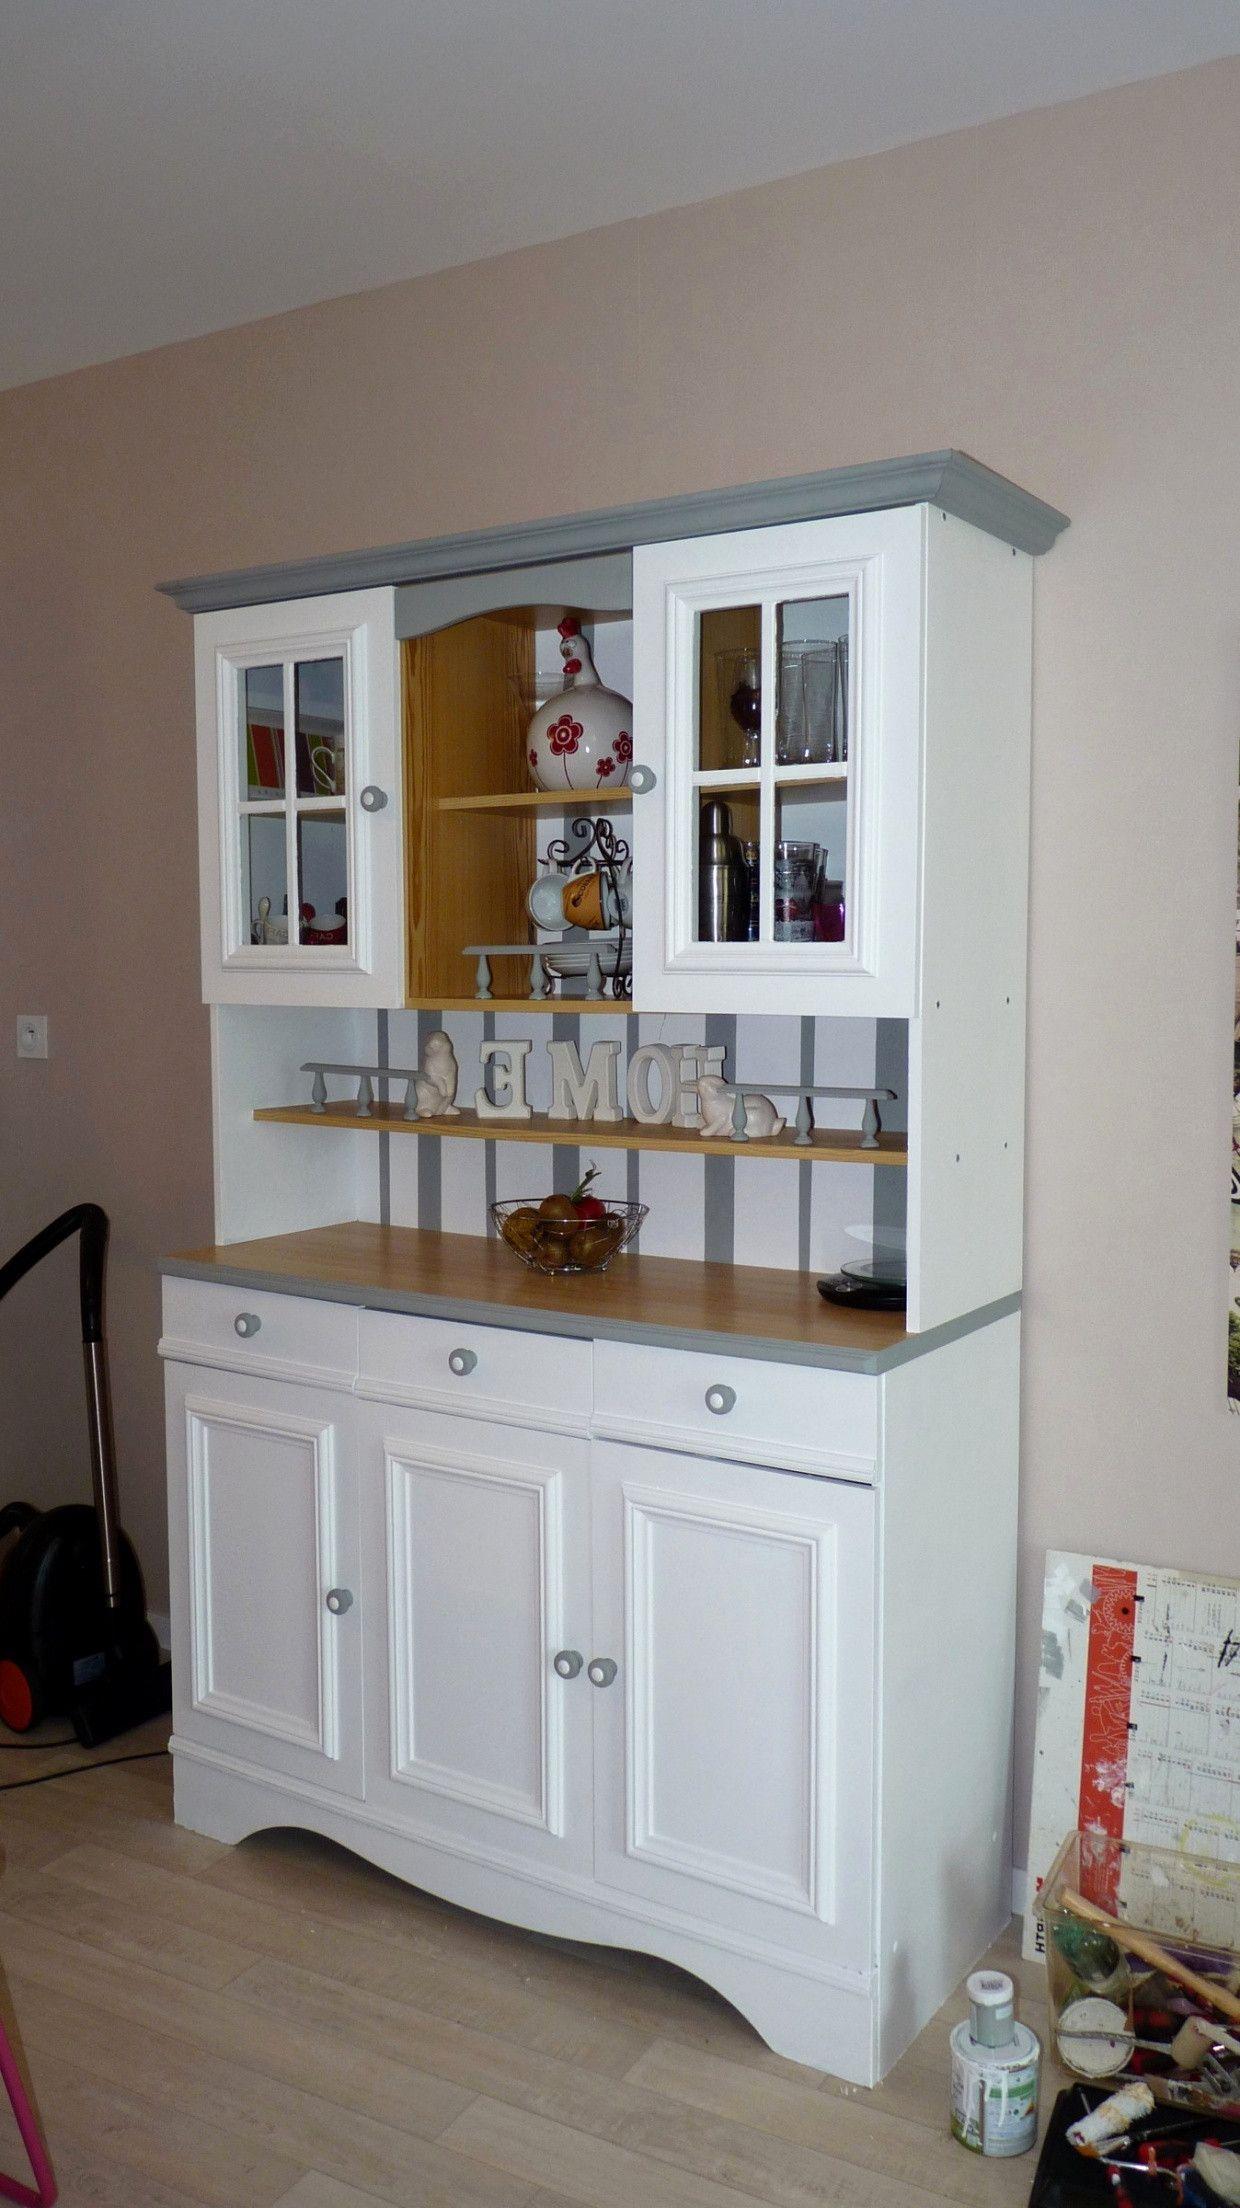 12 Beau Le Bon Coin Meuble Photo Kitchen Cabinets Home Decor Home